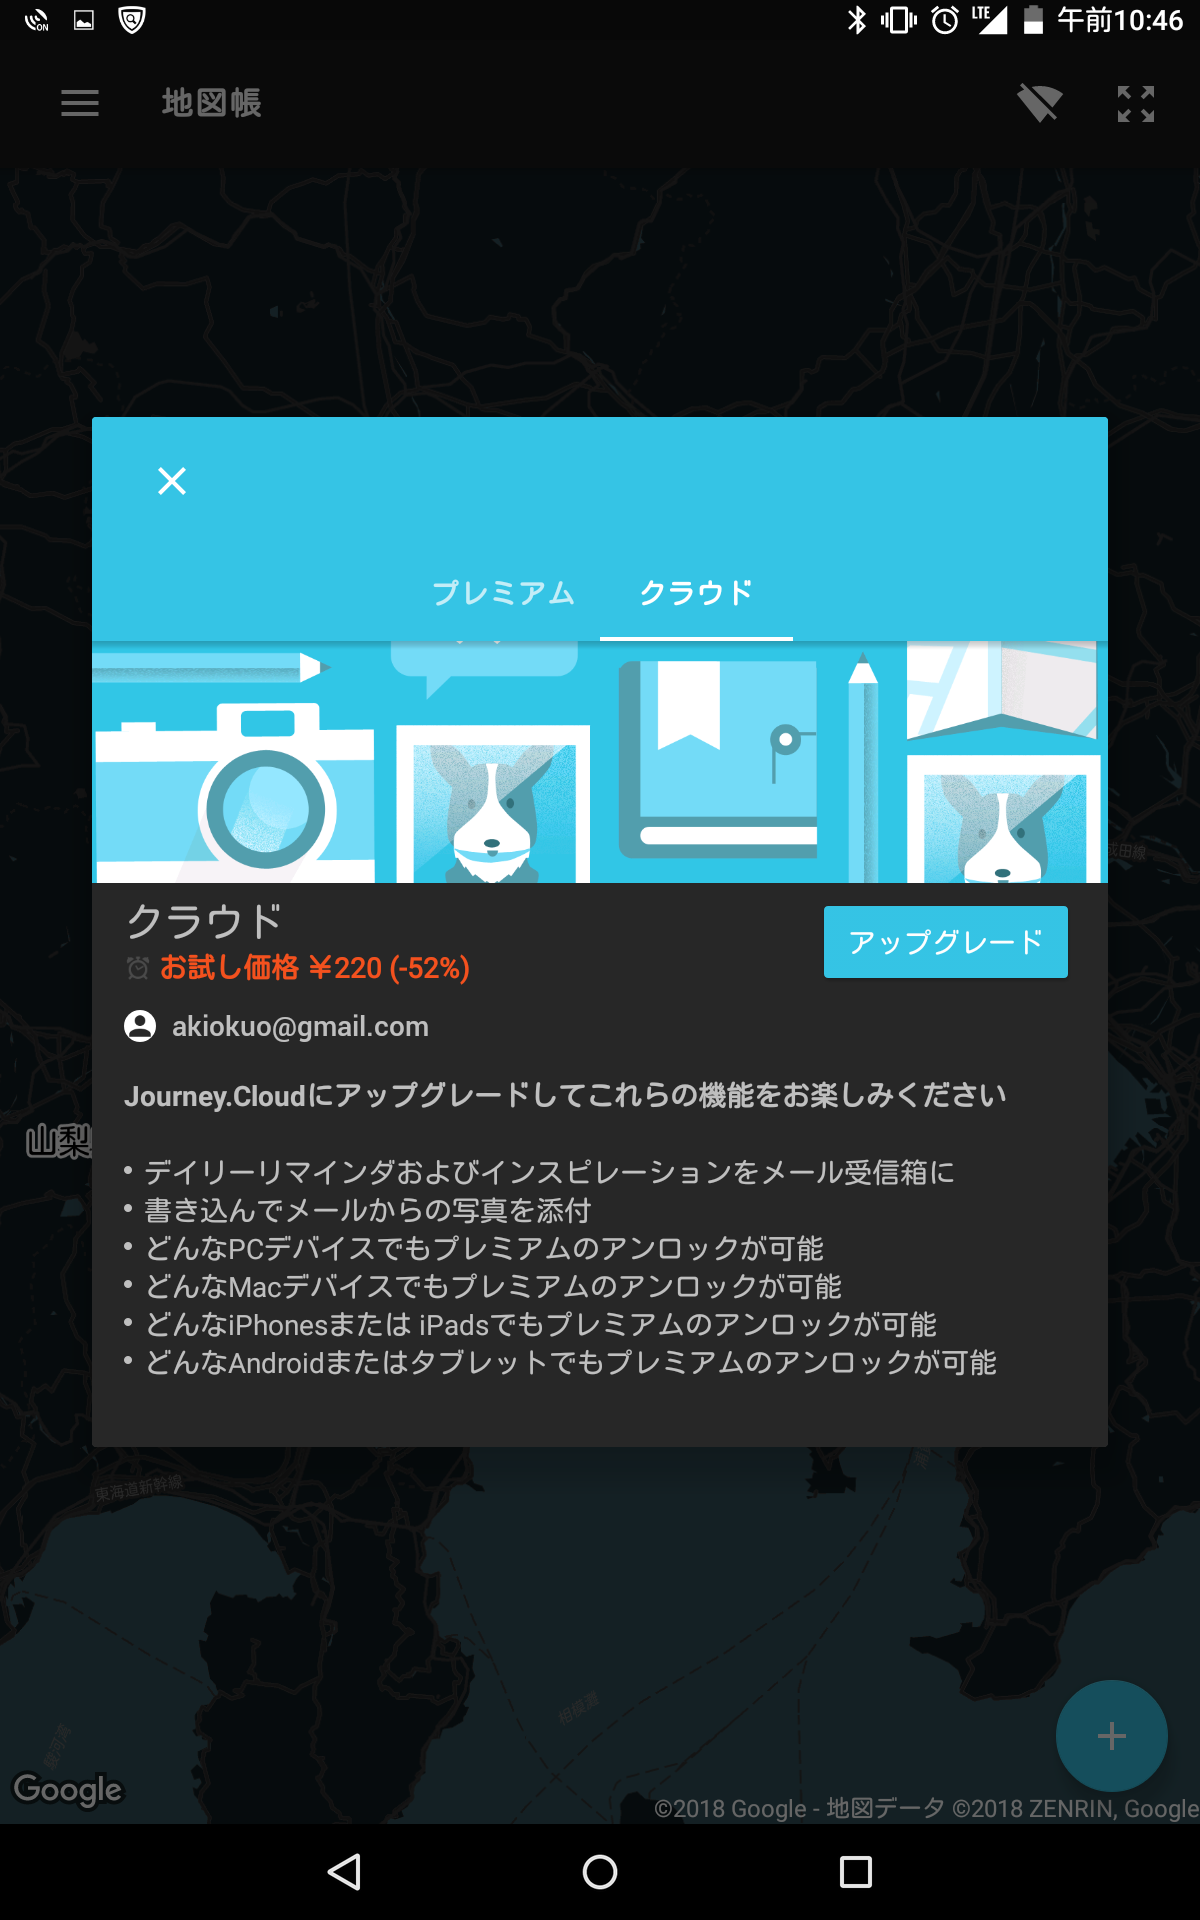 Screenshot_2018-04-17-10-46-10.png